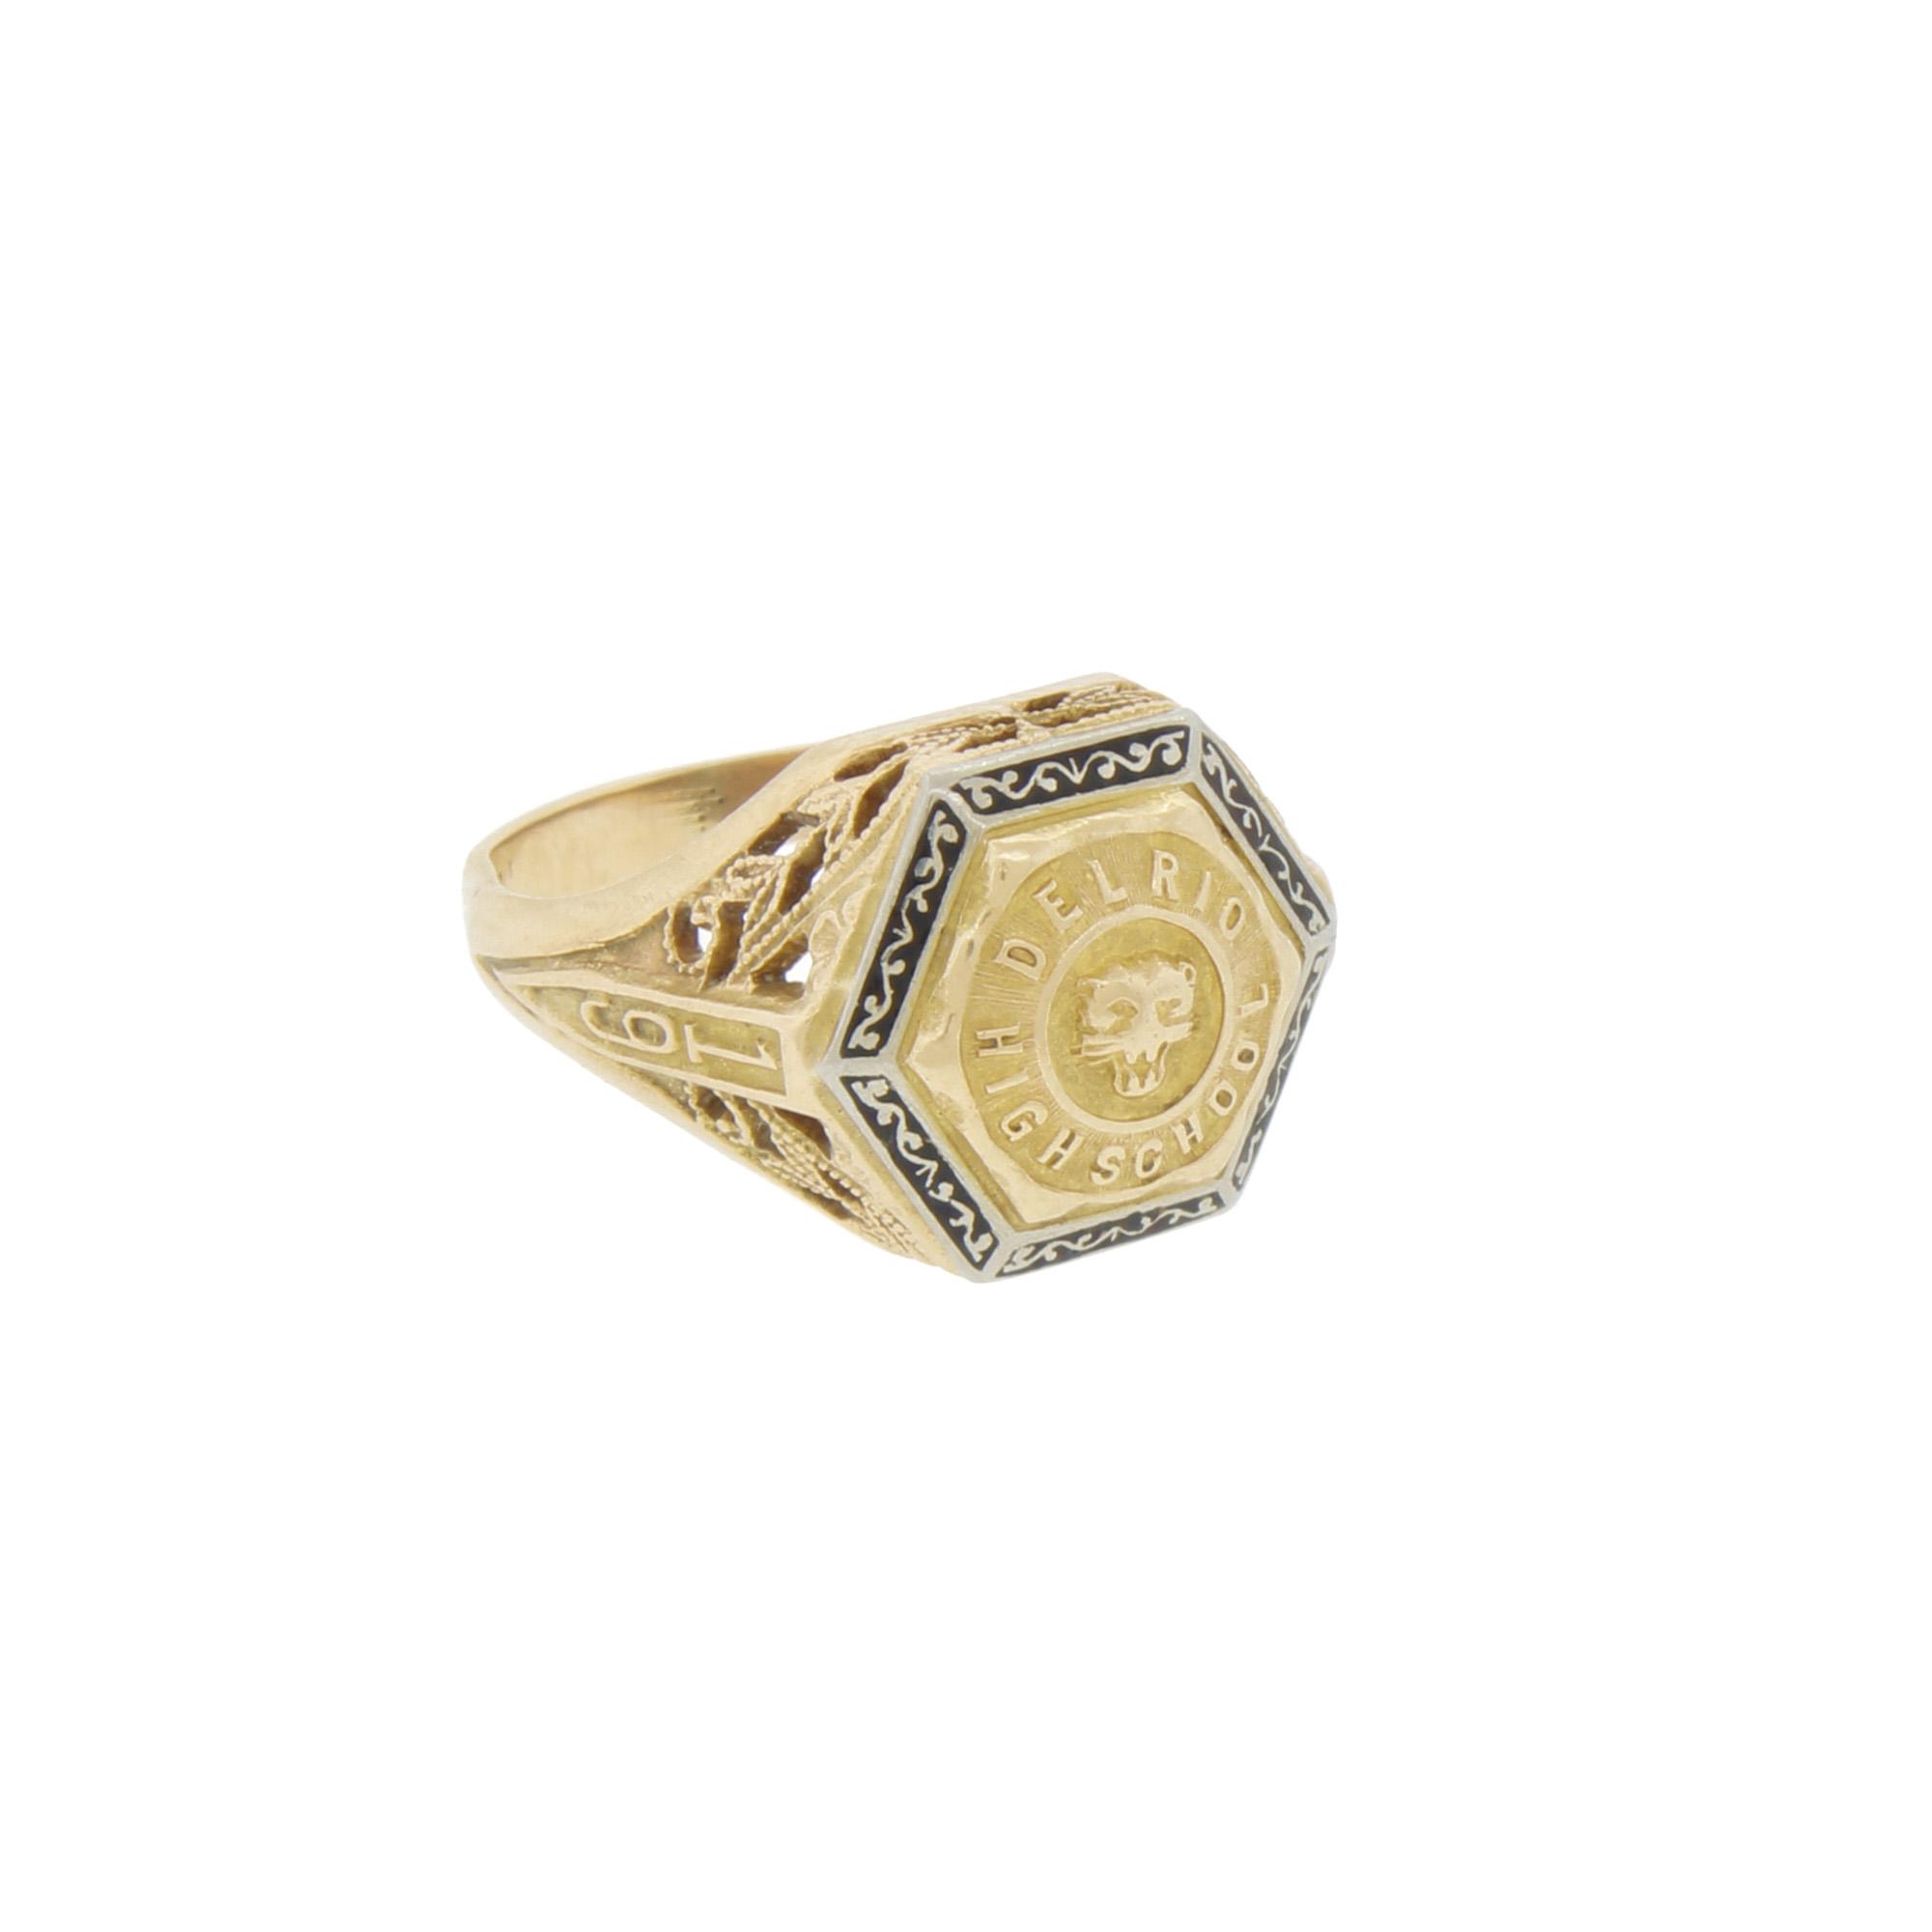 Vintage Art Deco 10k Gold Enamel 1928 Del Rio High School Panther Class Ring